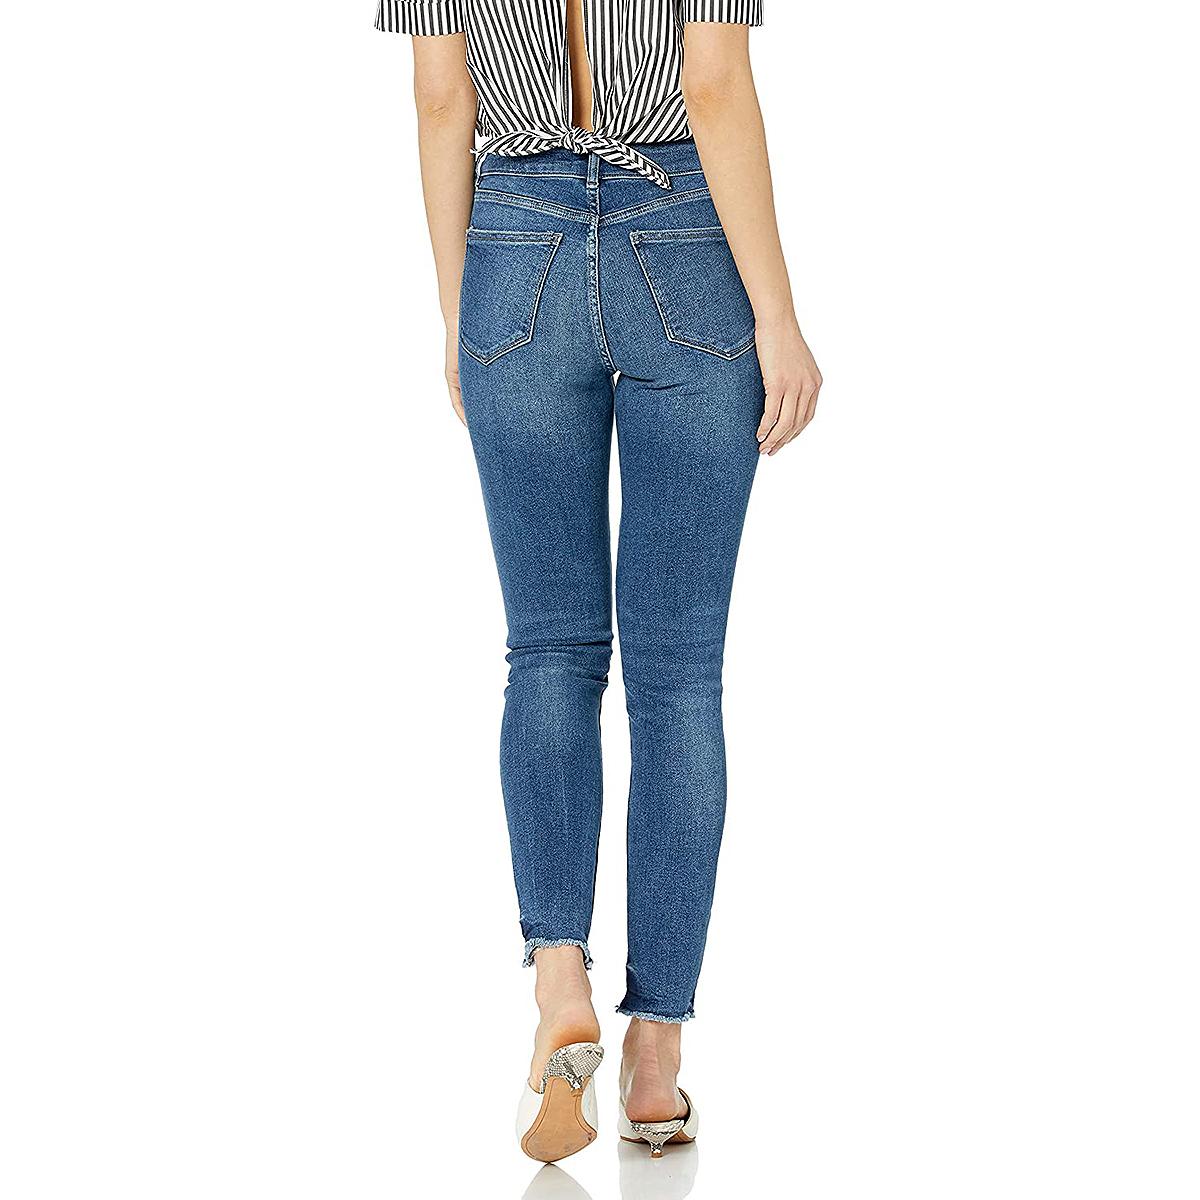 dl1961-farrow-jeans-back